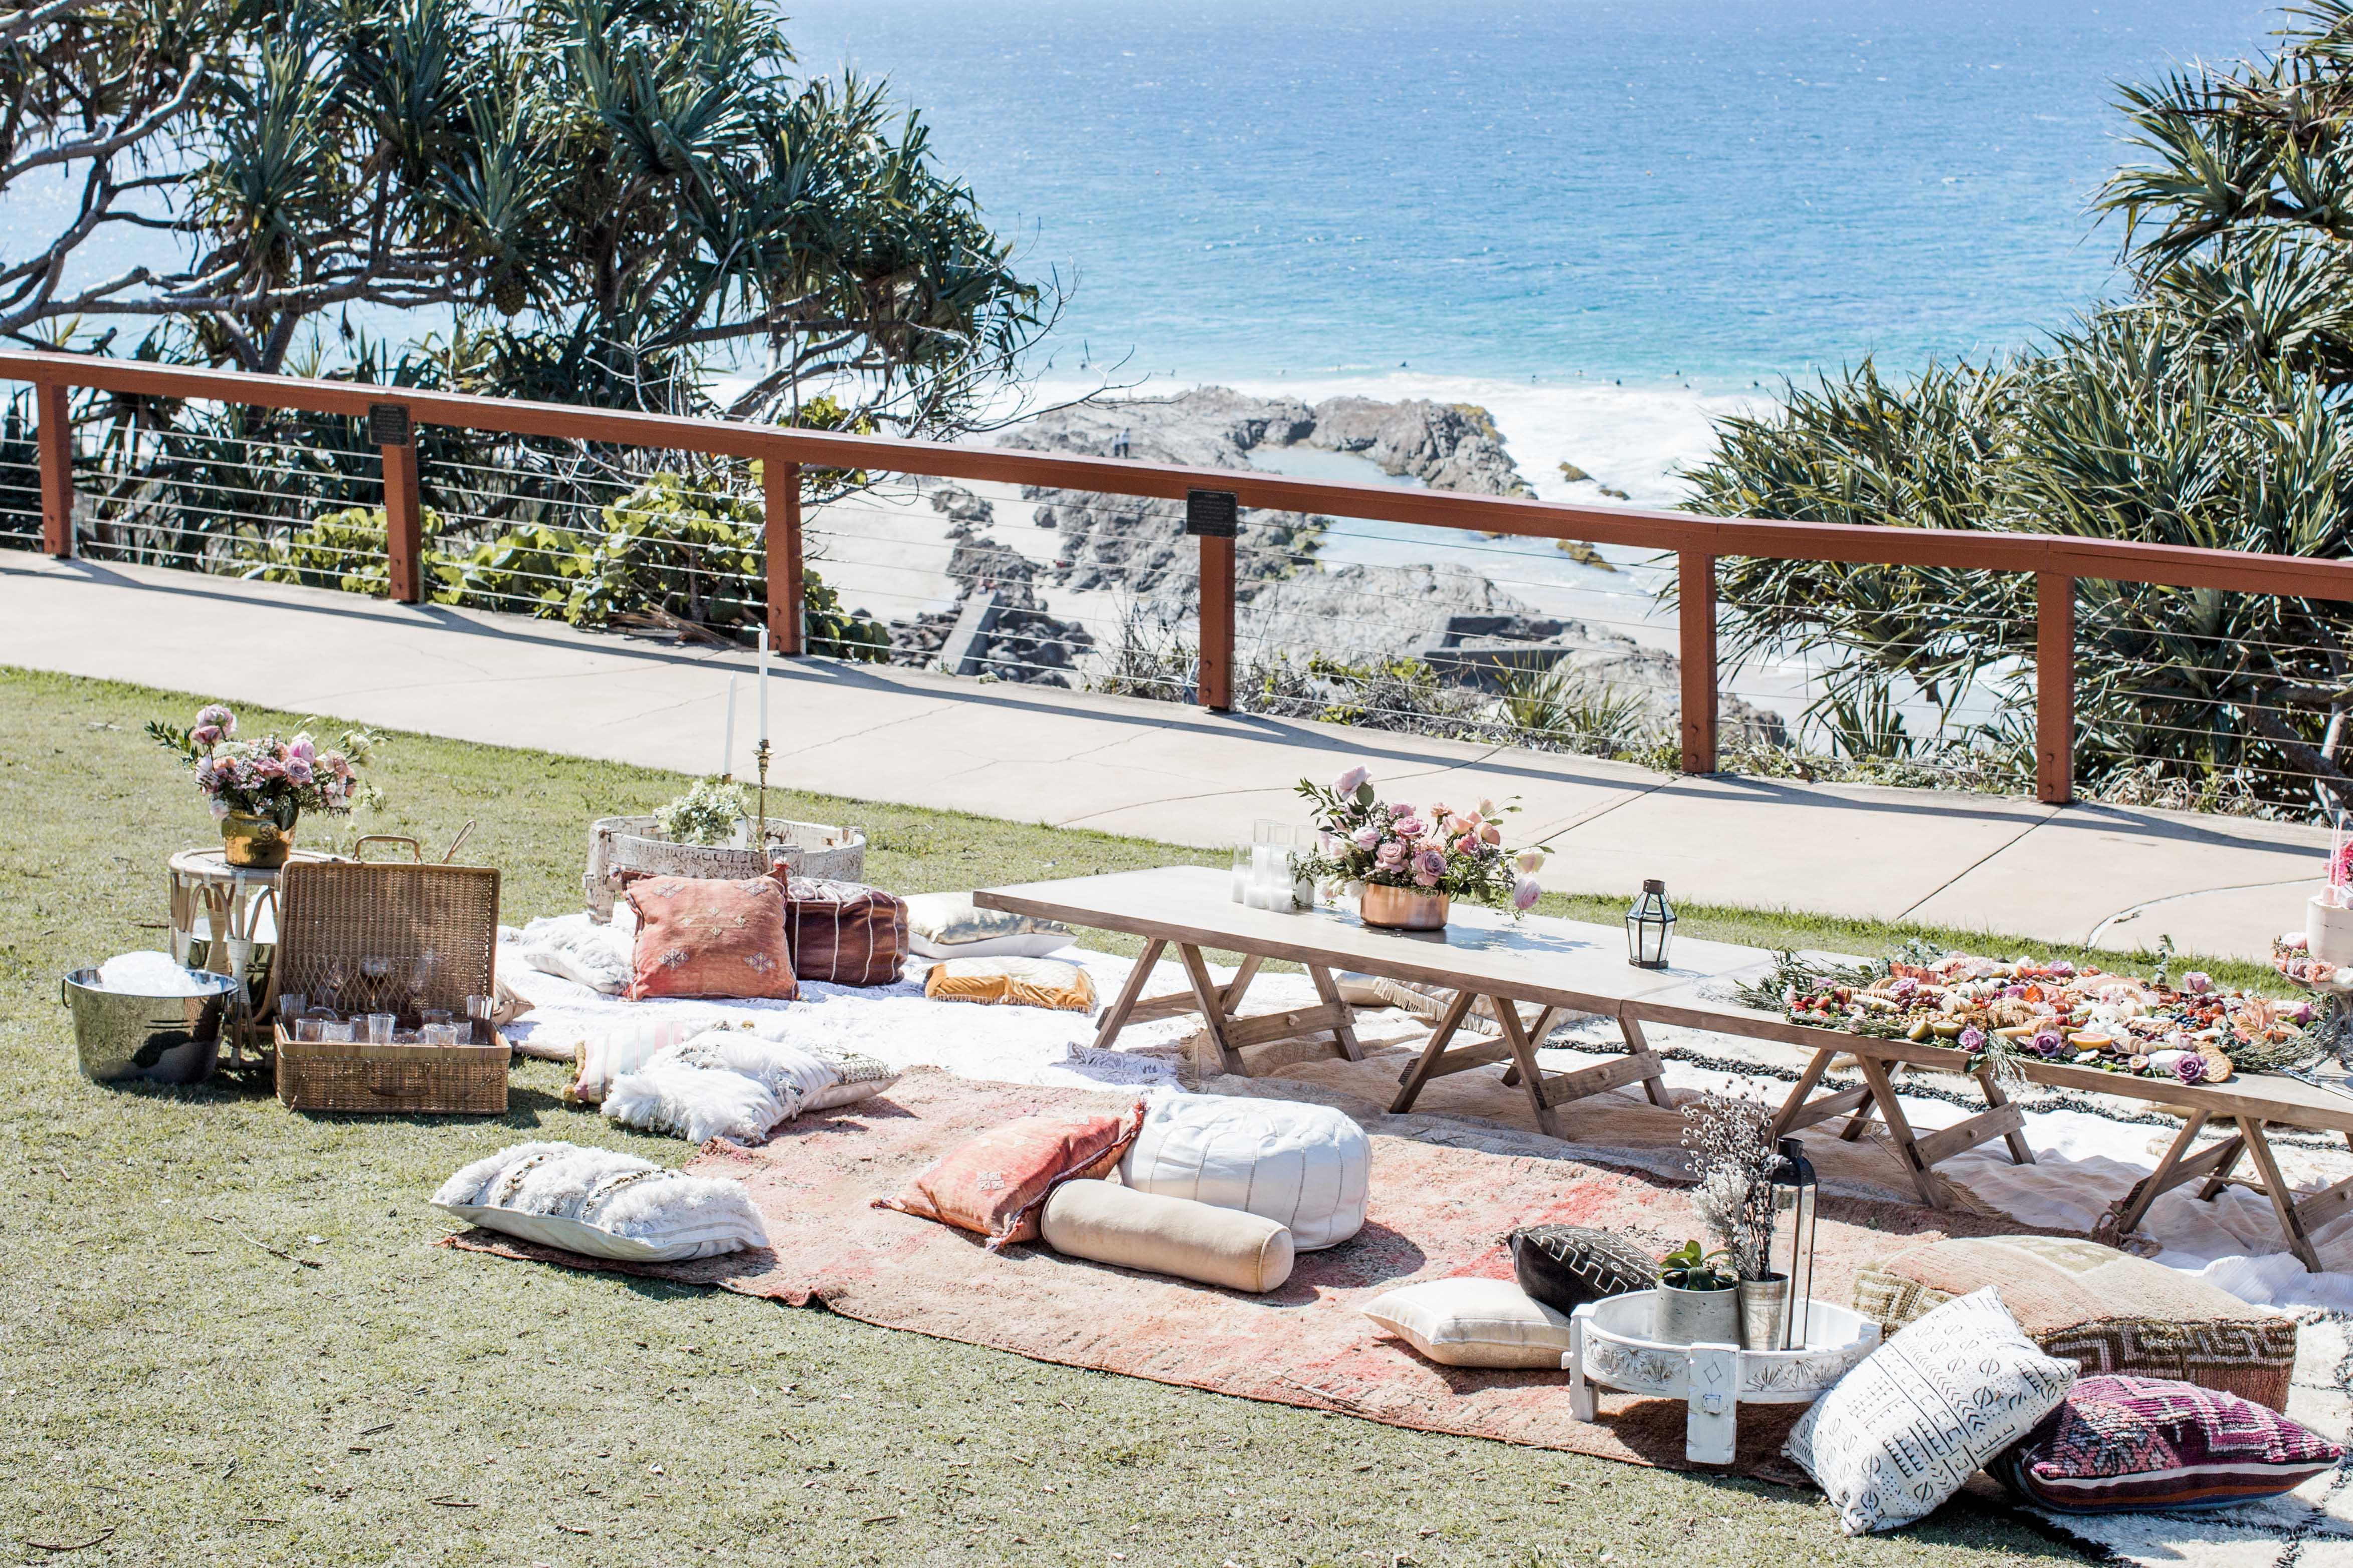 Seaside Picnic: Celeste Barber, 40th Birthday Celebration | The Events Lounge, Gold Coast Event Planner & Stylist